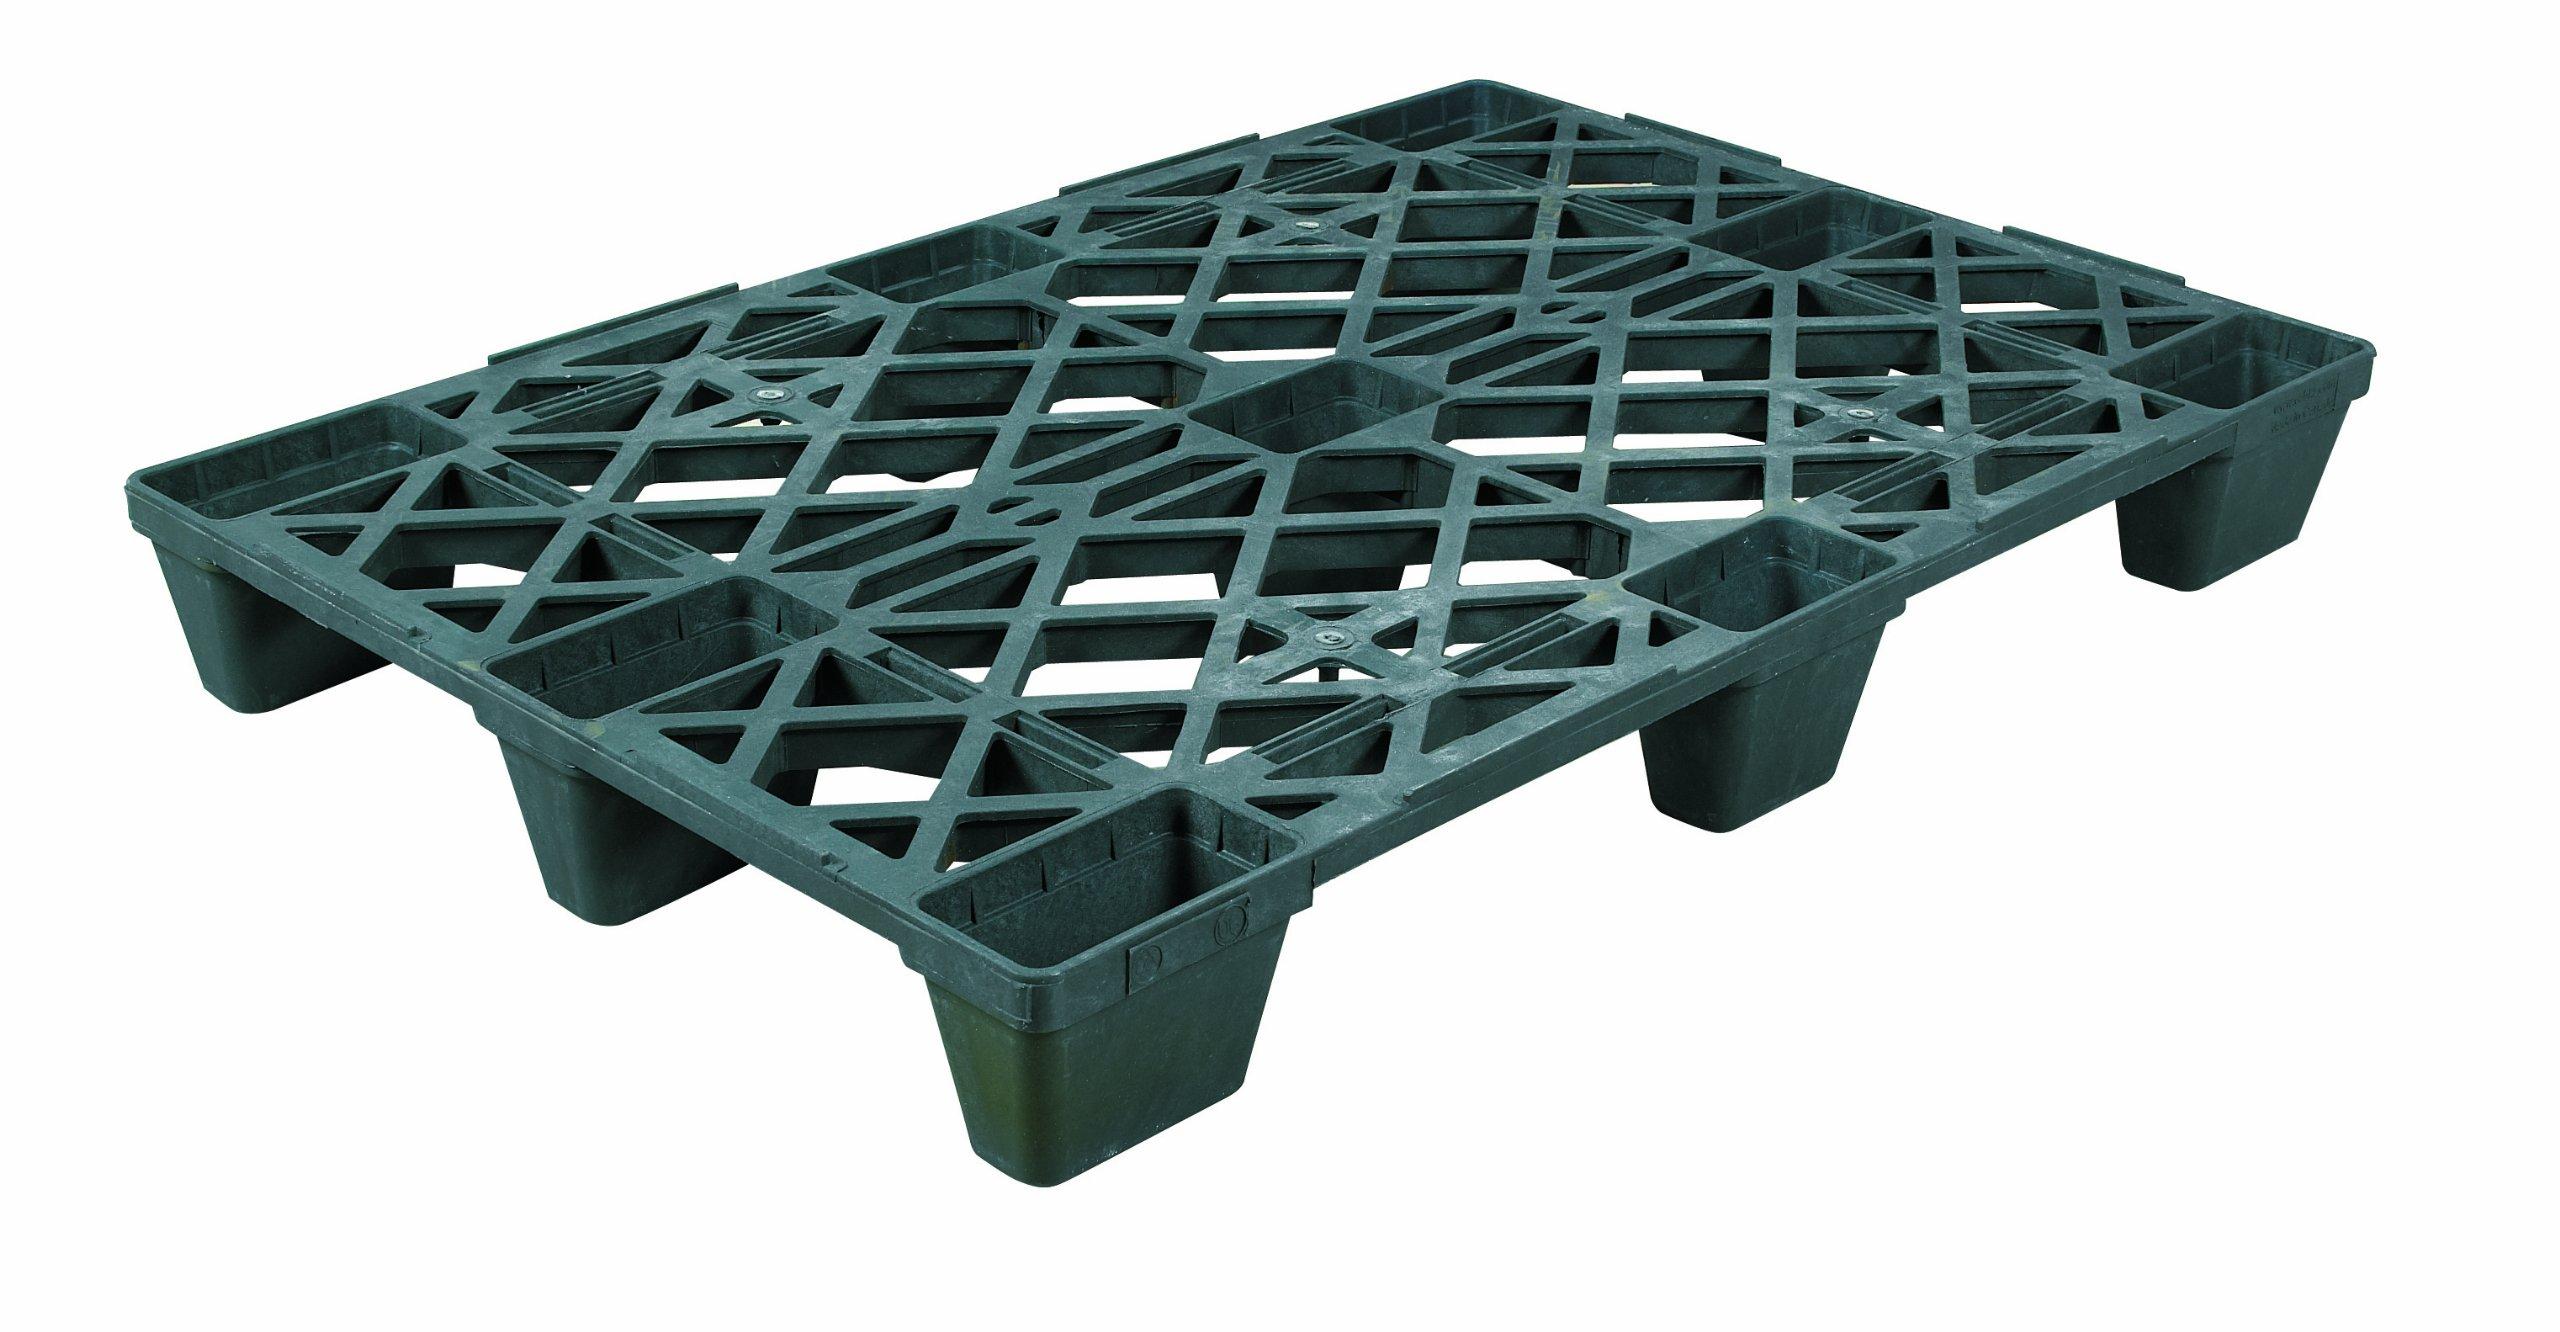 Aviditi CPP210 Industrial Plastic Pallet, 48'' x 32'' x 5 1/2'', Black